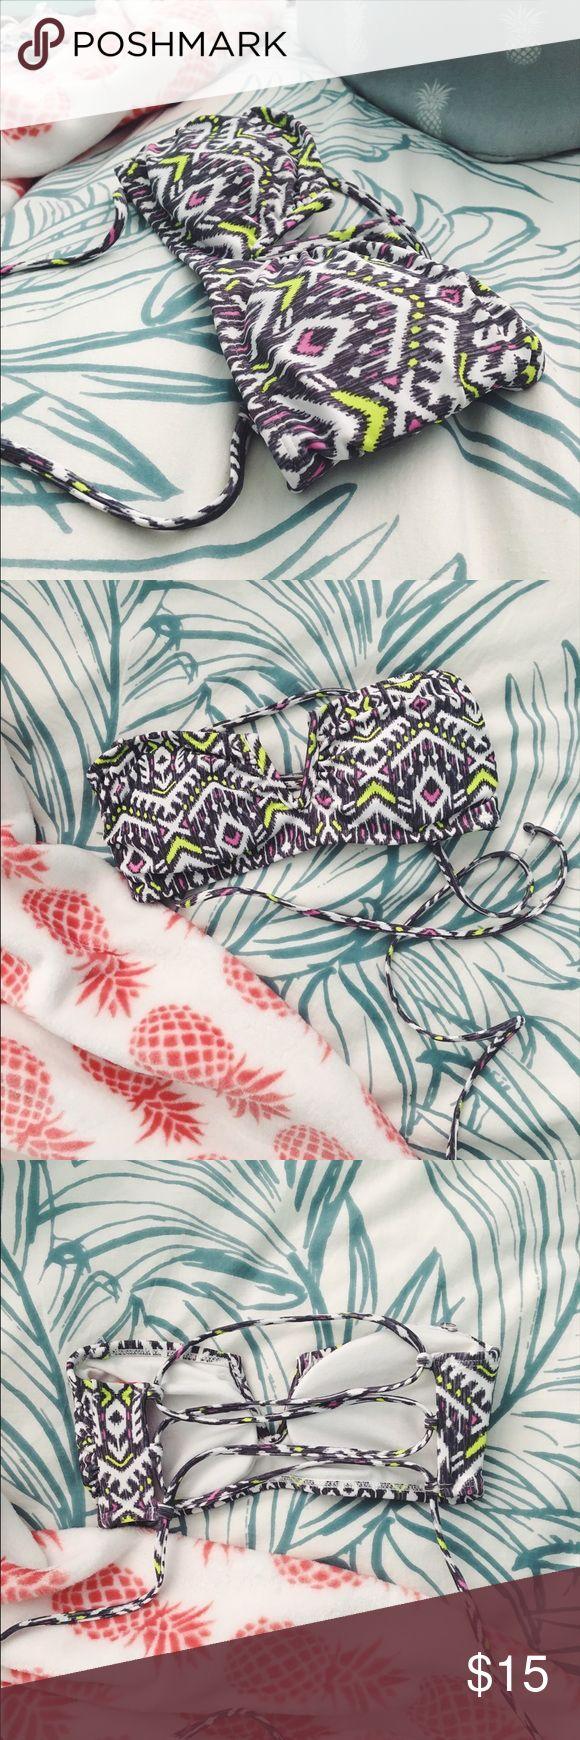 Vs pink bandeau bikini top Size extra small vs pink bandeau bikini top. Ripped out tags because it itched PINK Victoria's Secret Swim Bikinis